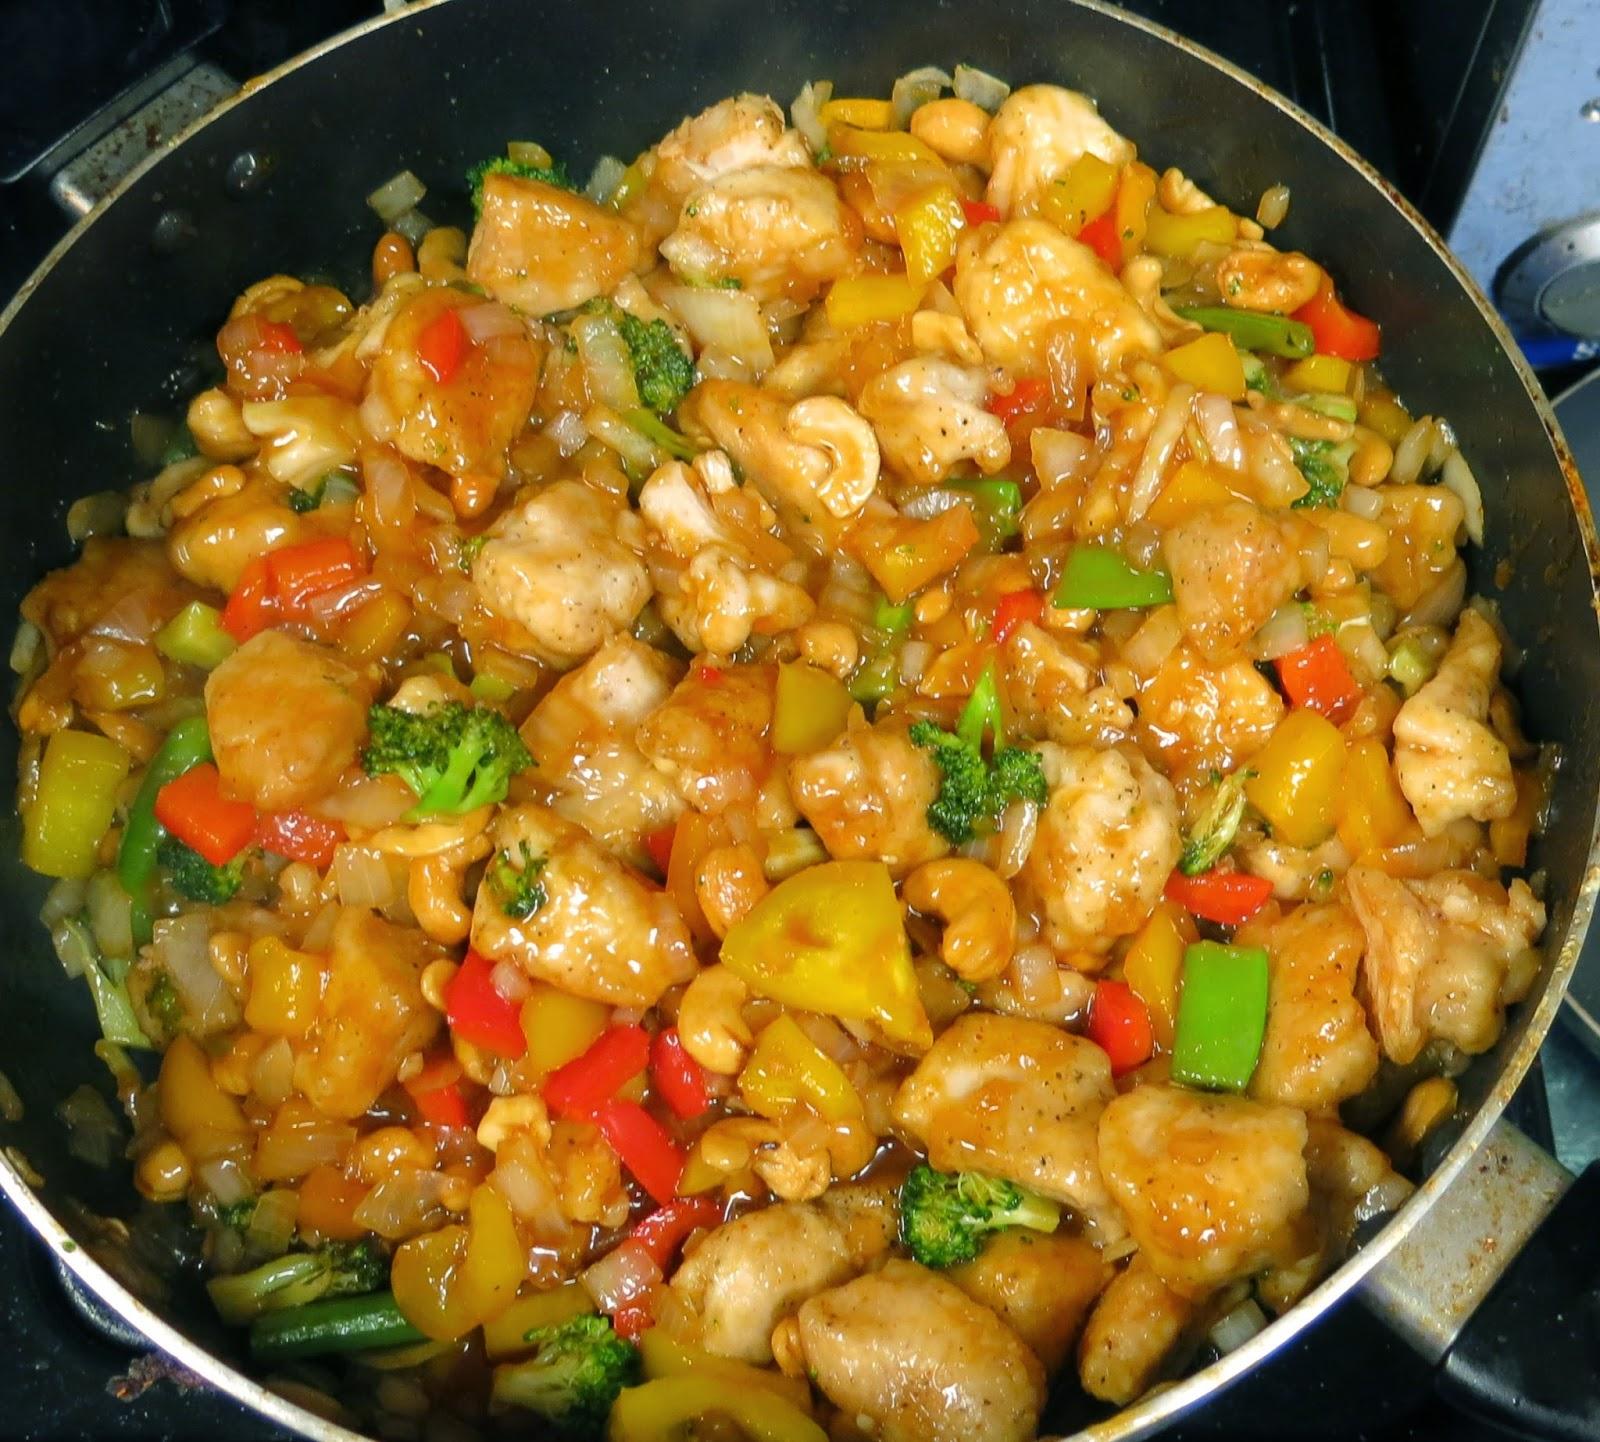 ... Healthy & Low Calorie: Honey Sriracha Cashew Chicken #TripleSBites